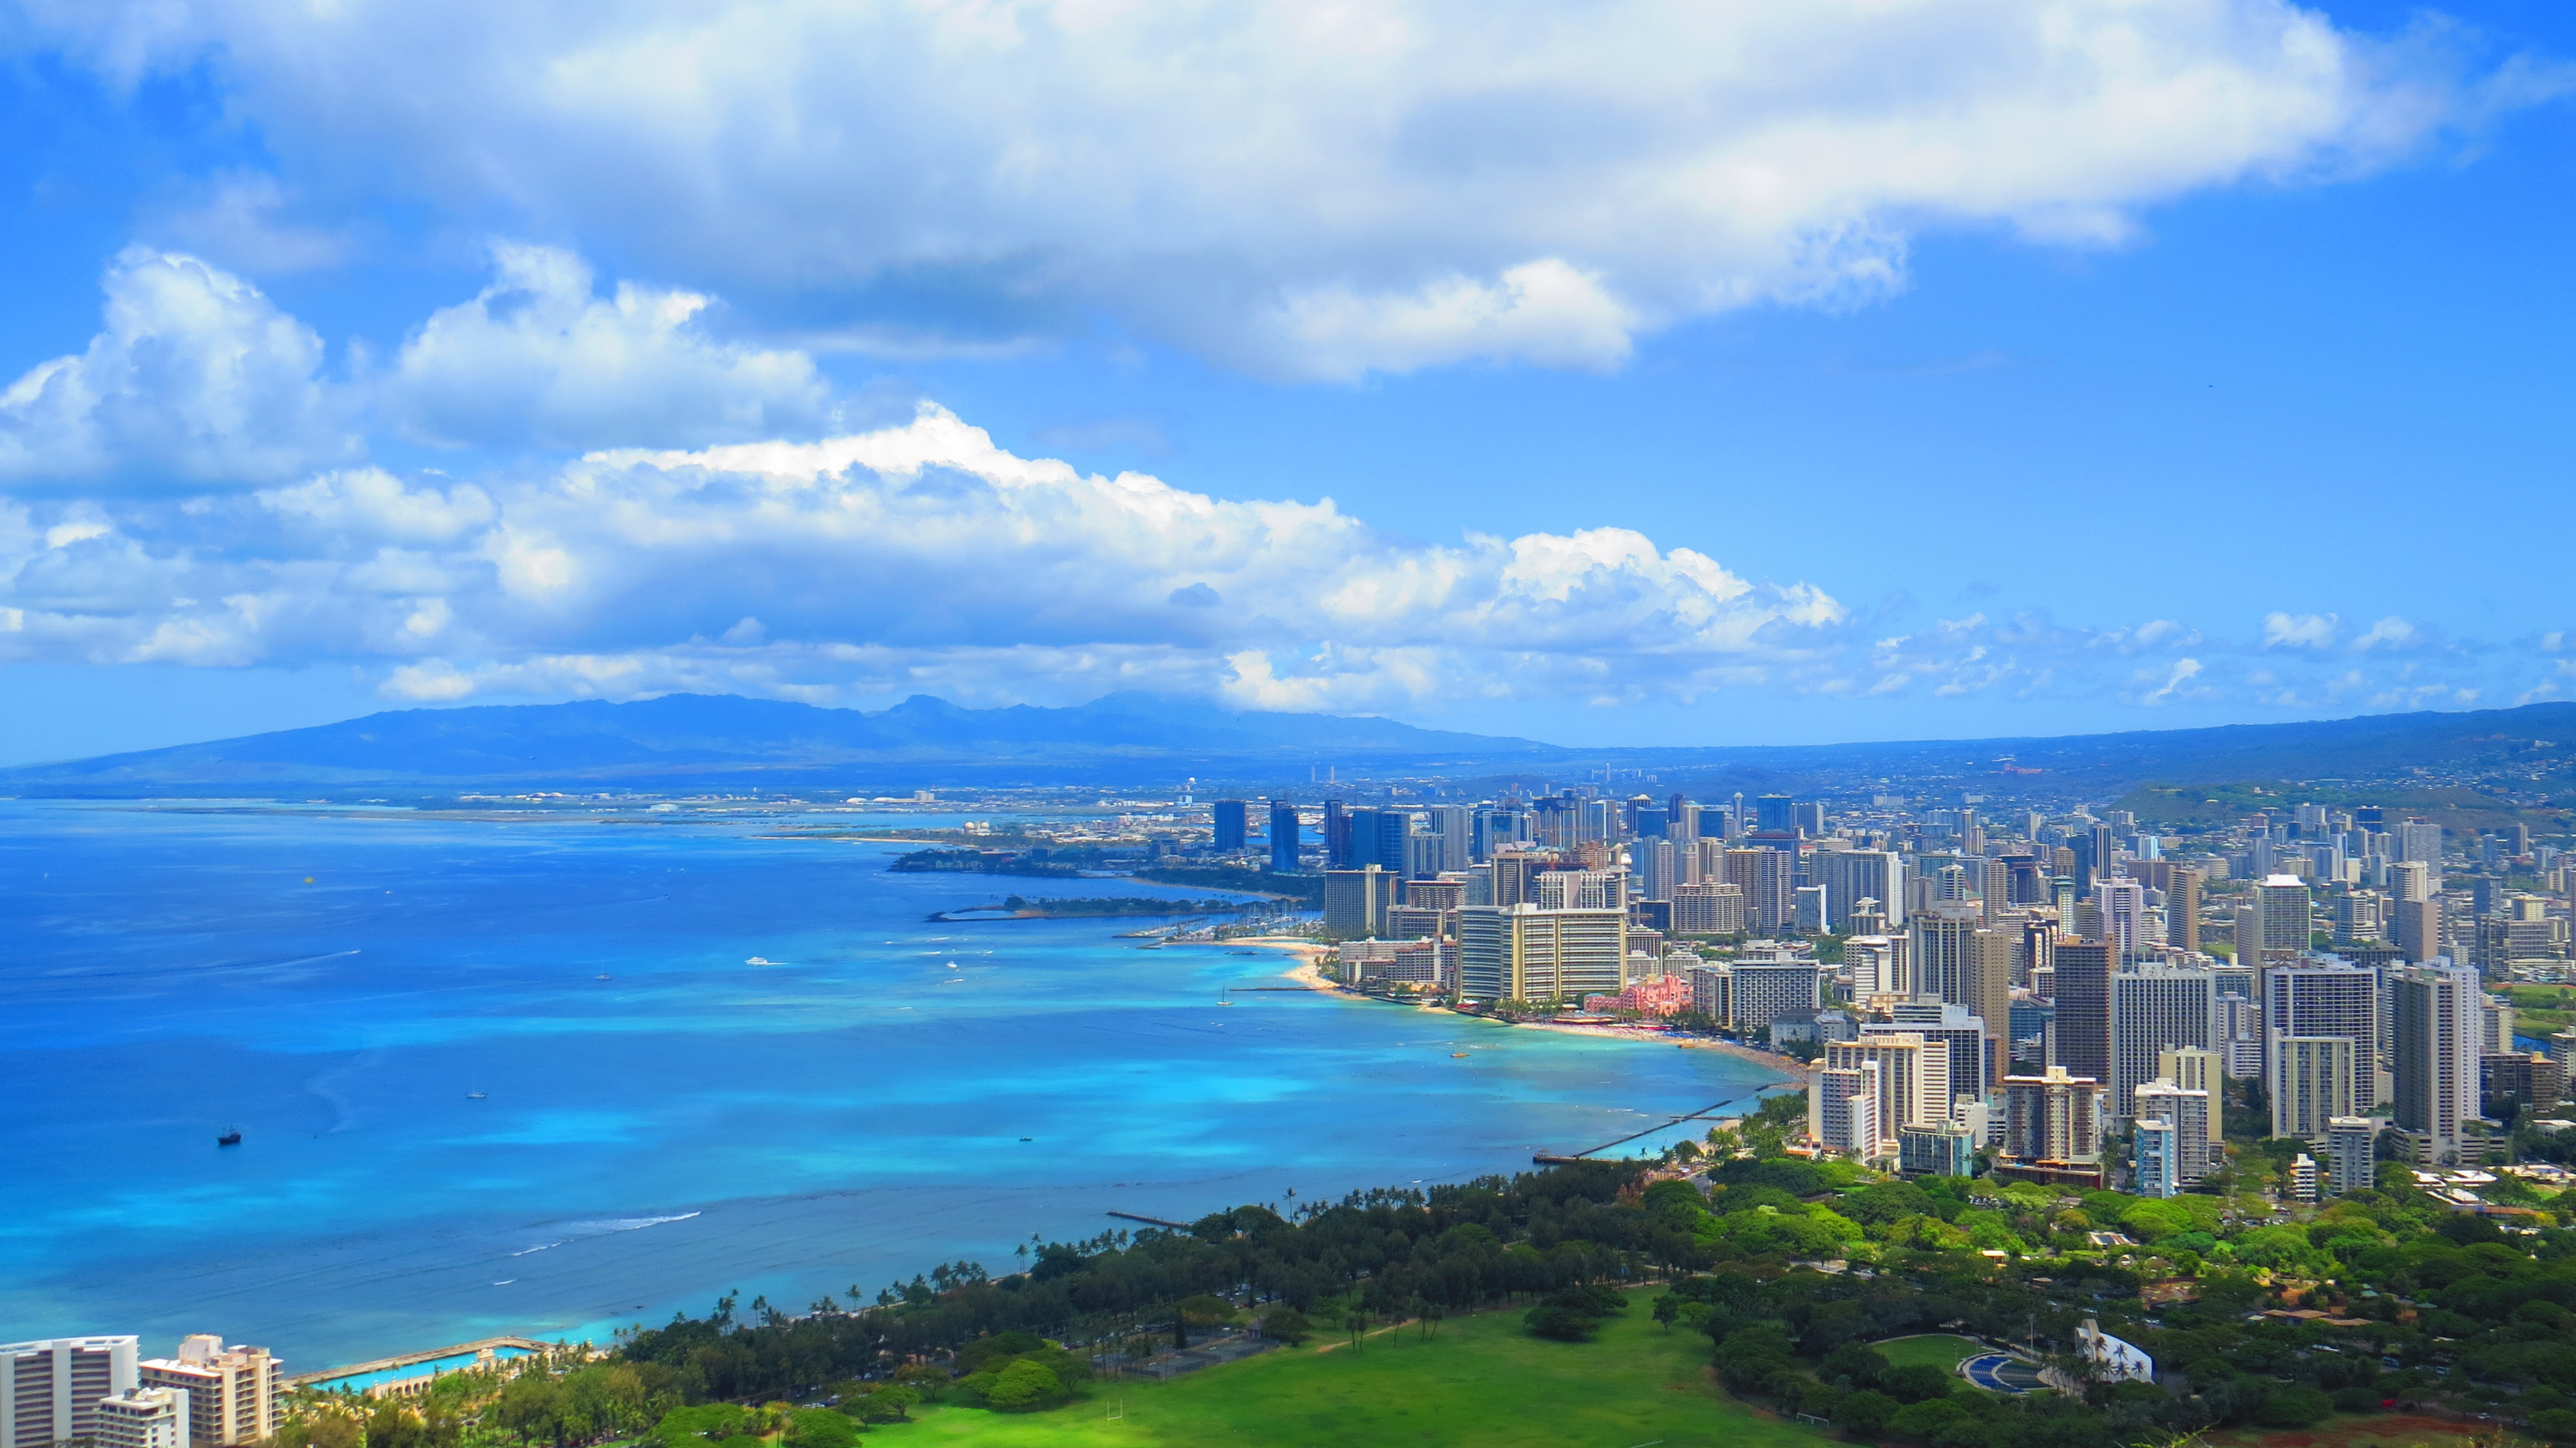 Downtown Honolulu and Waikiki from Diamond Head